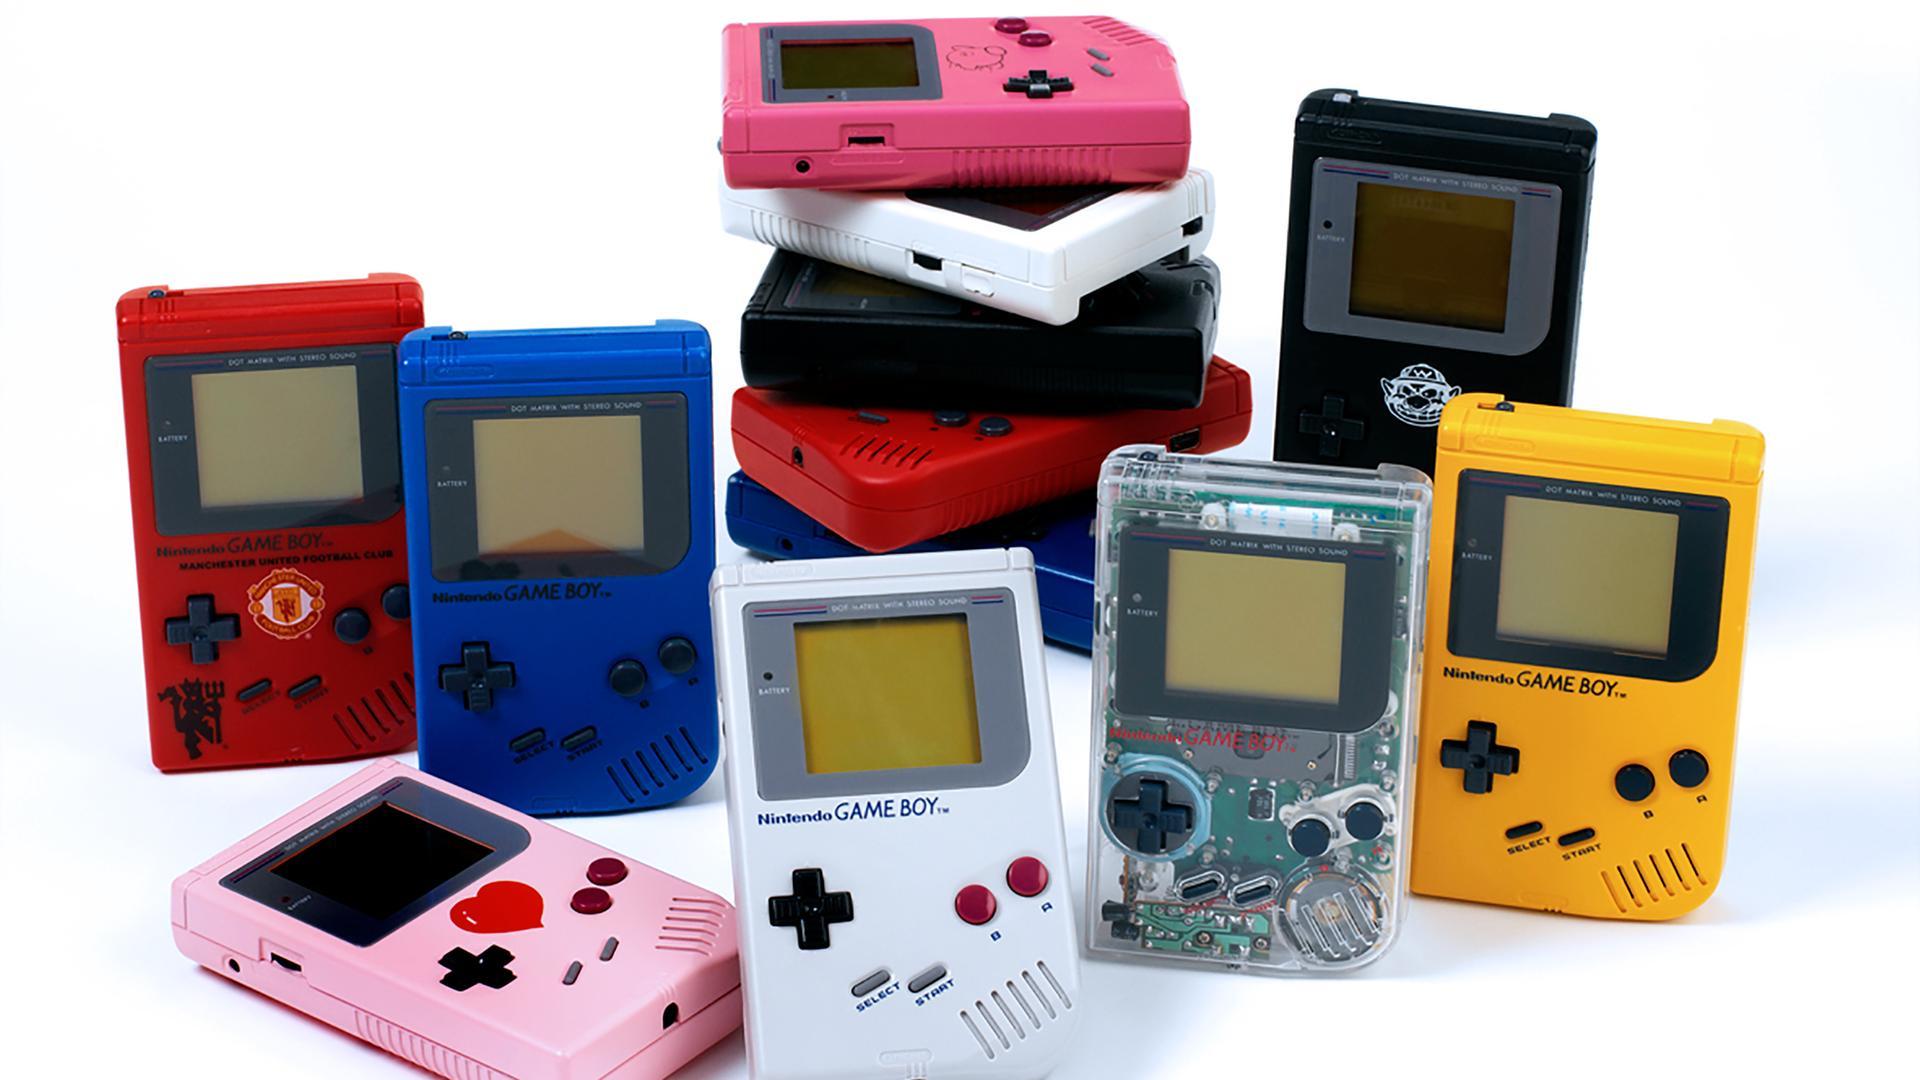 8250d68e87633 Nintendos größter Erfolg  Klassiker mit Kultstatus  Game Boy wird 30 ...